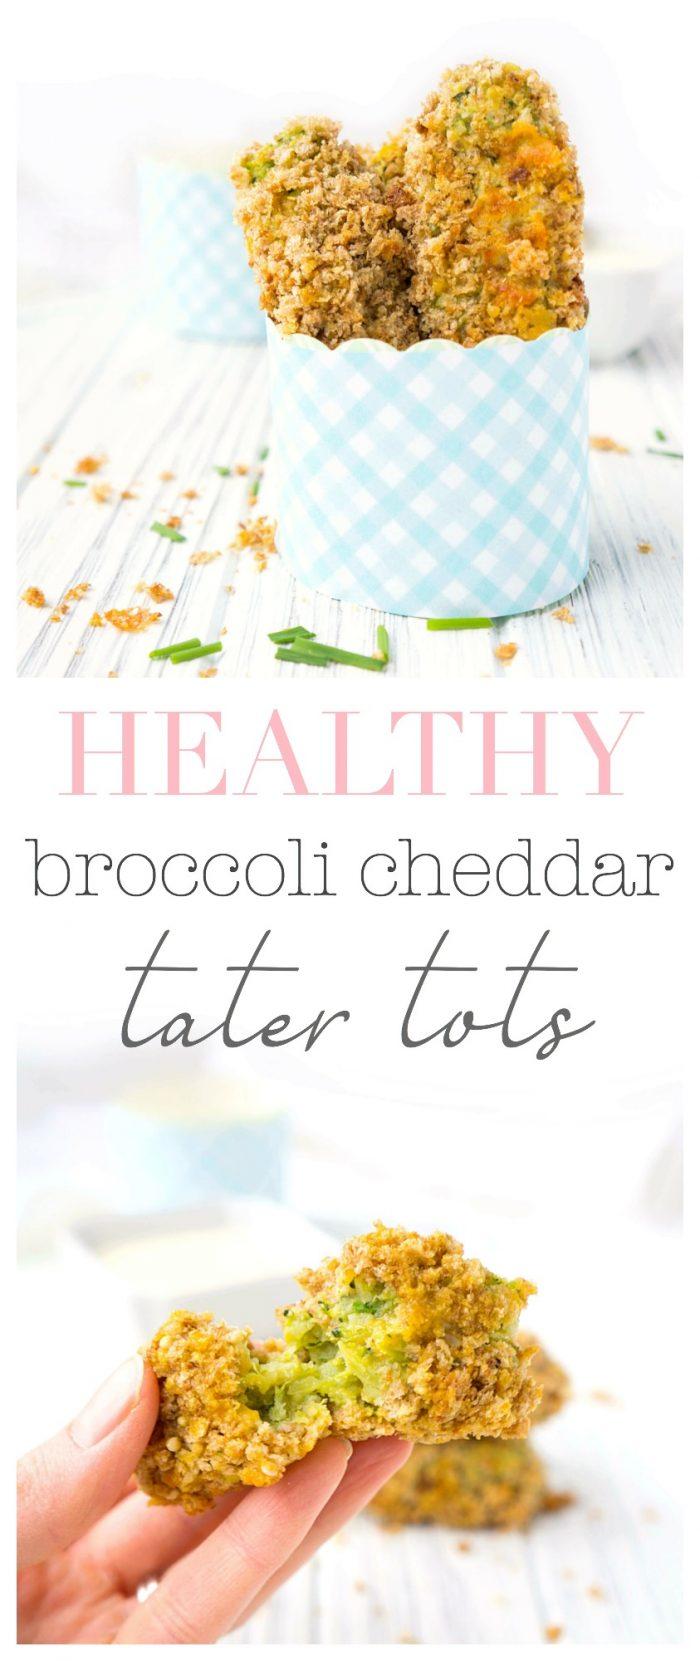 Broccoli Cheddar Tater Tots